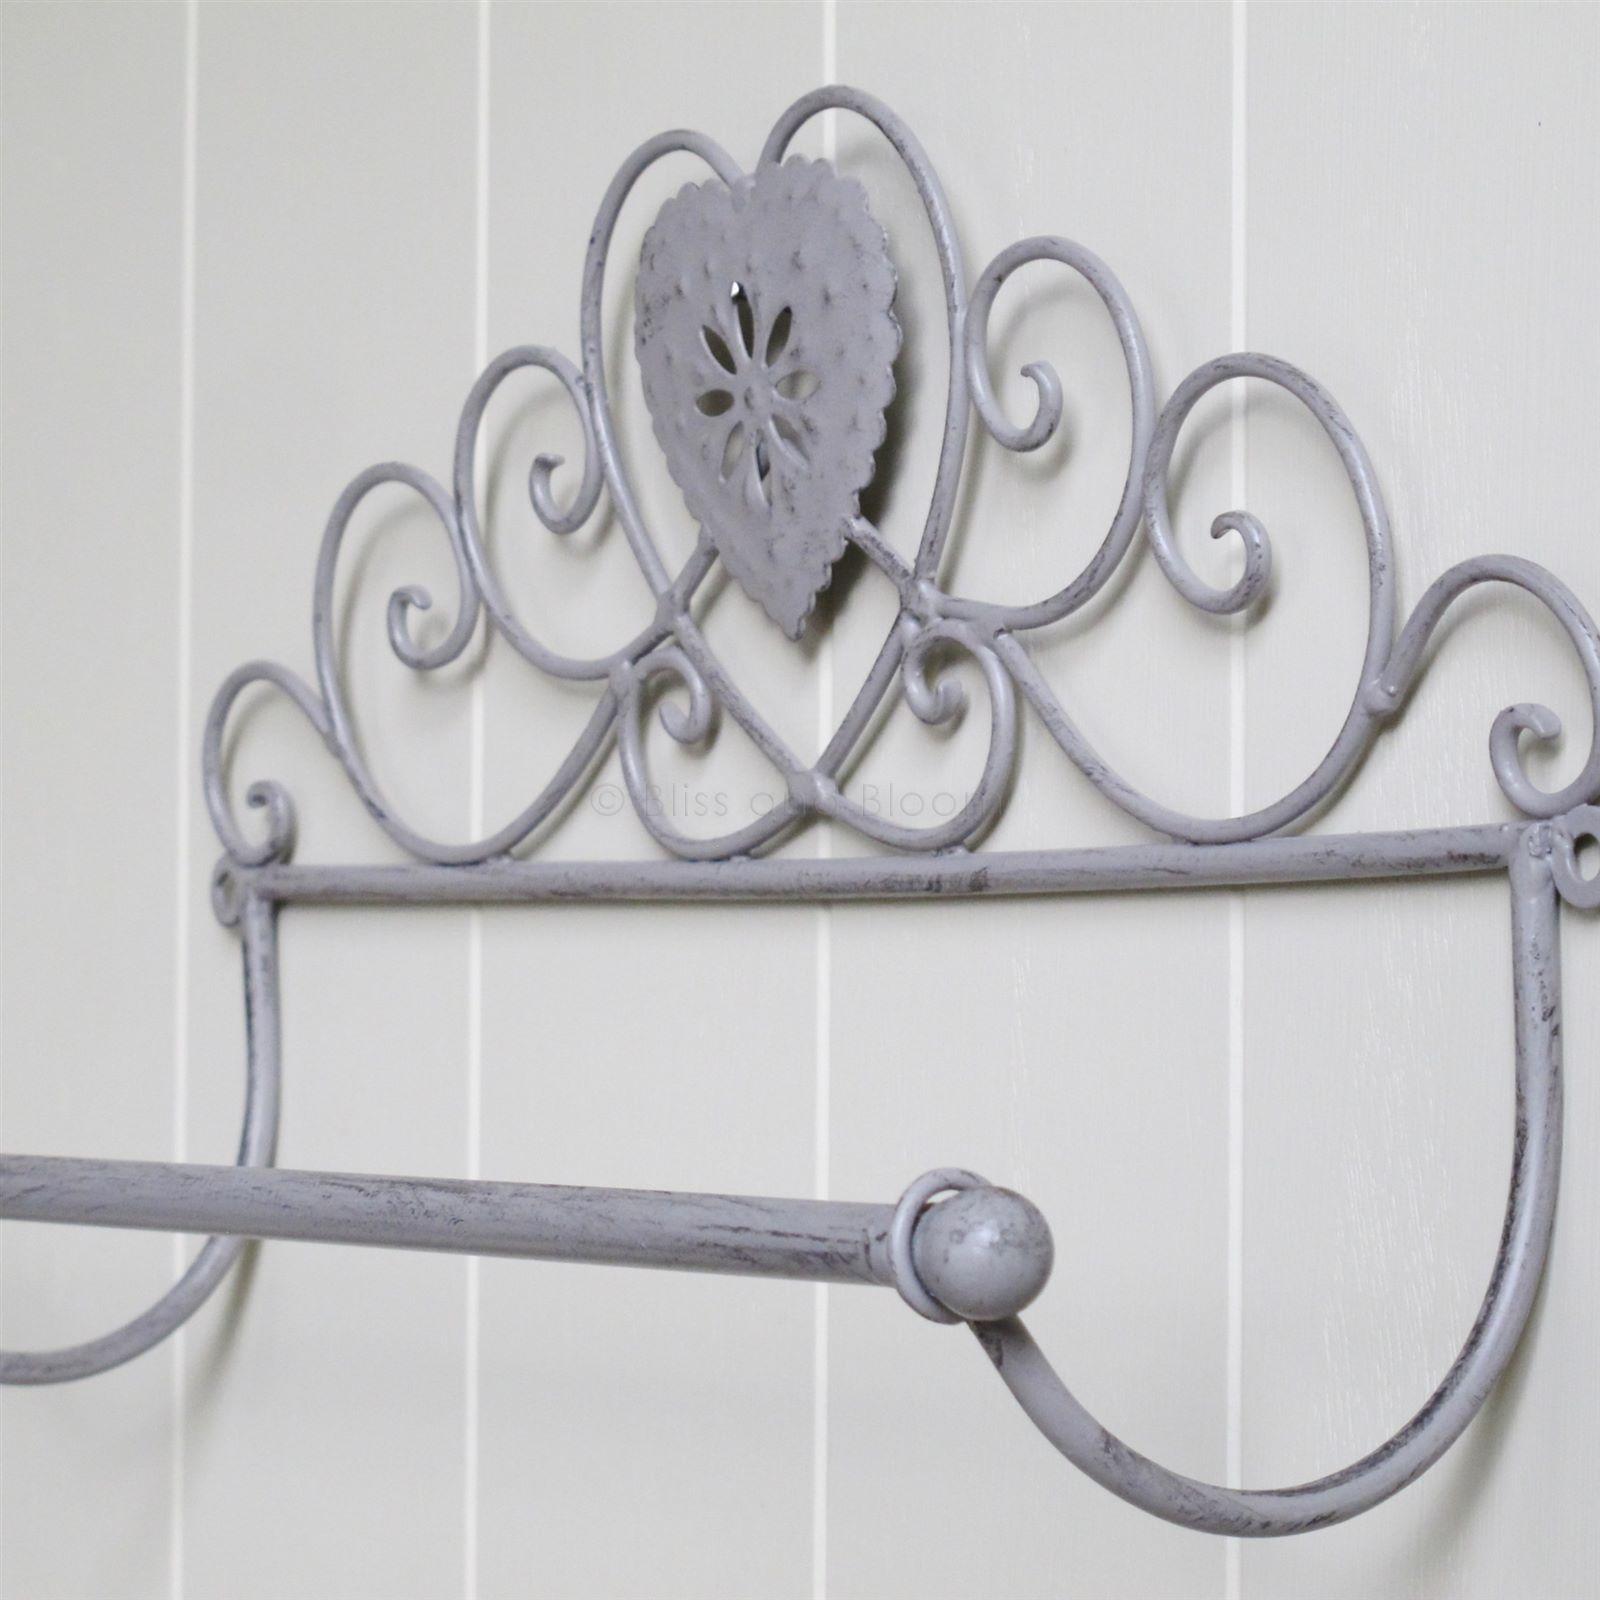 Grey Heart Towel Rail | Bliss and Bloom Ltd